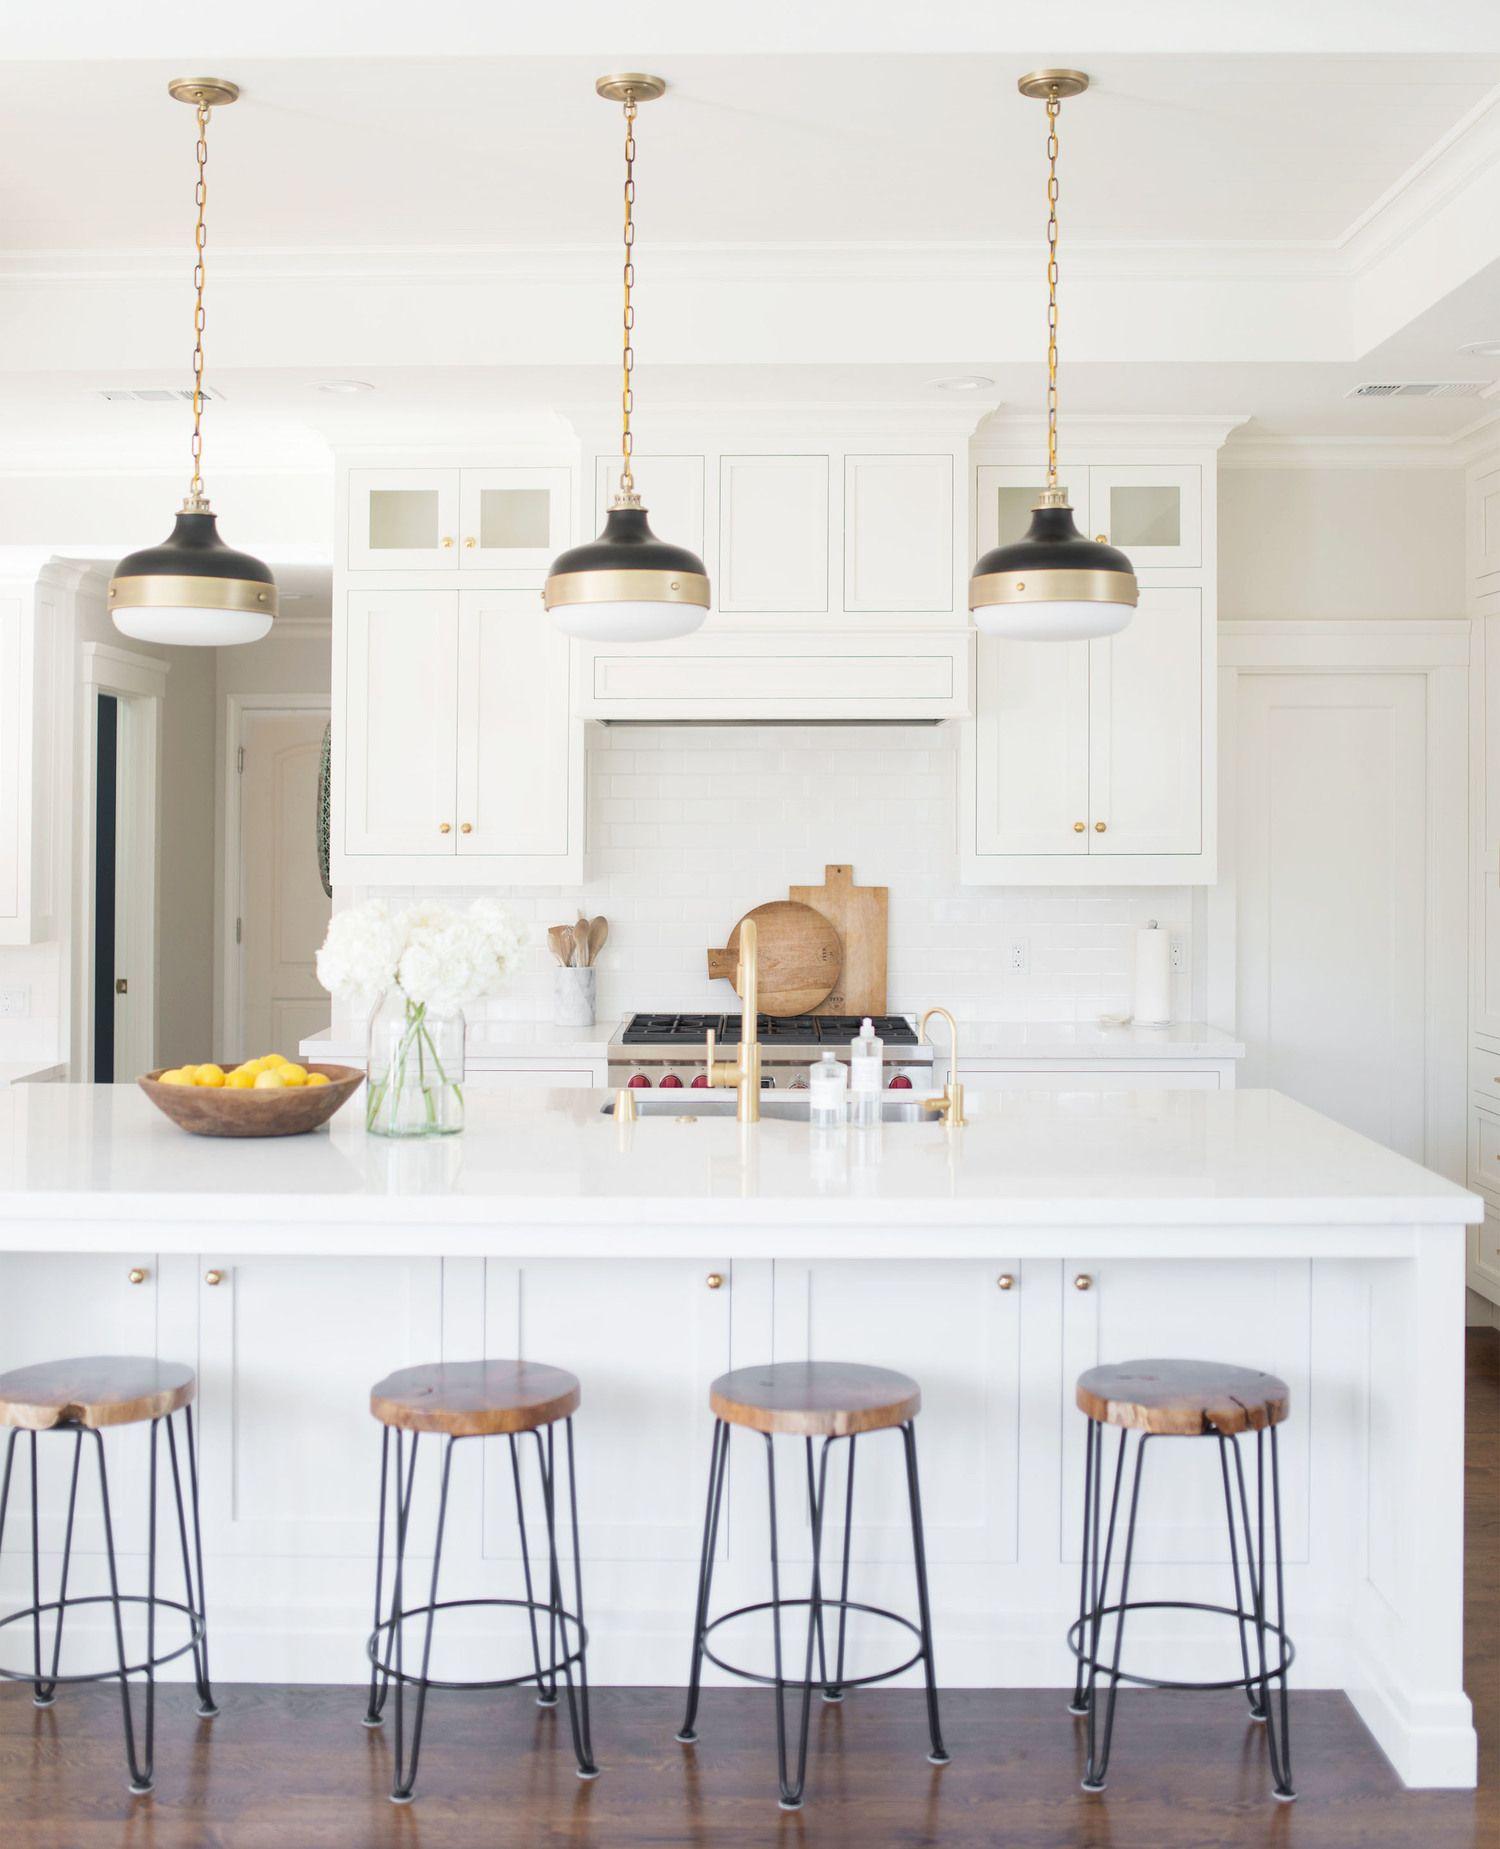 A Real Life E-Design | Pinterest | Wohnideen und Küche